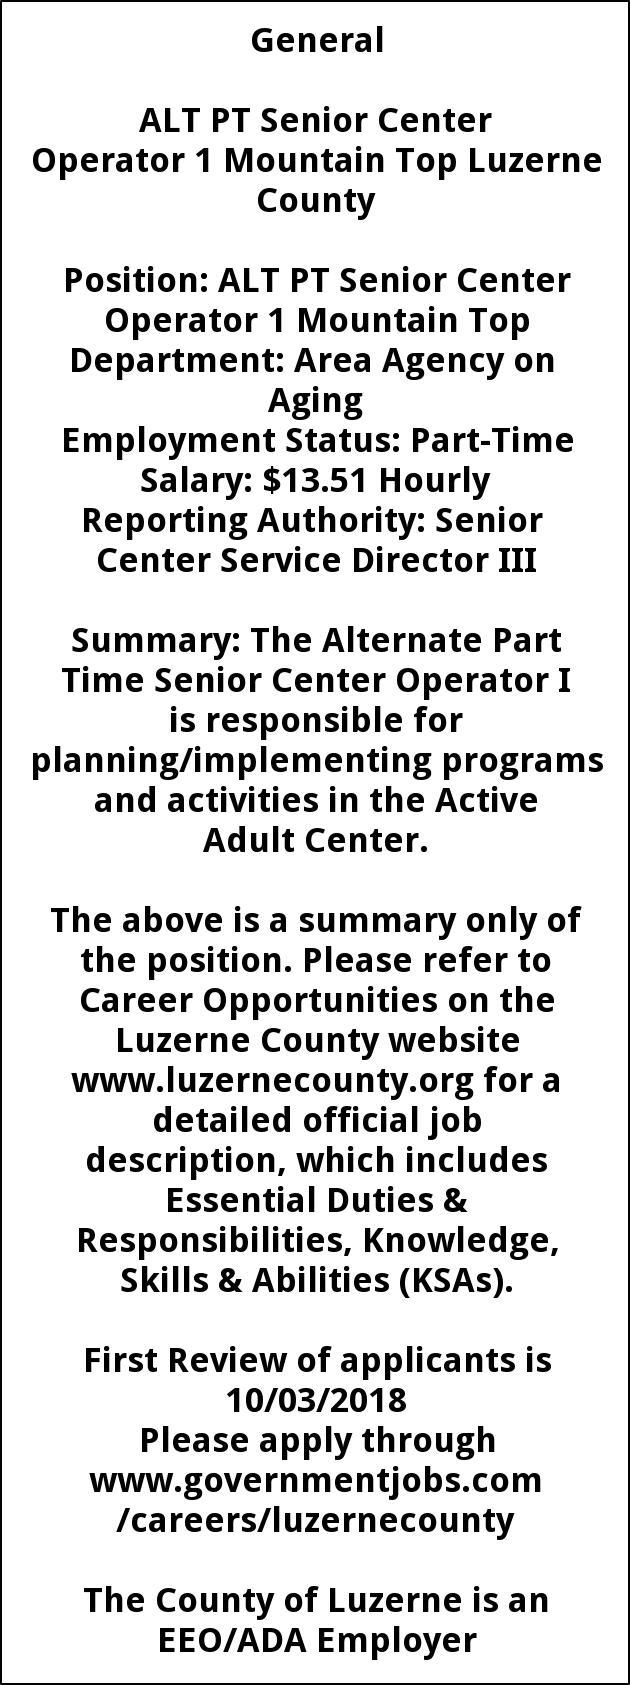 ALT PT Senior Service Ctr Operator 1